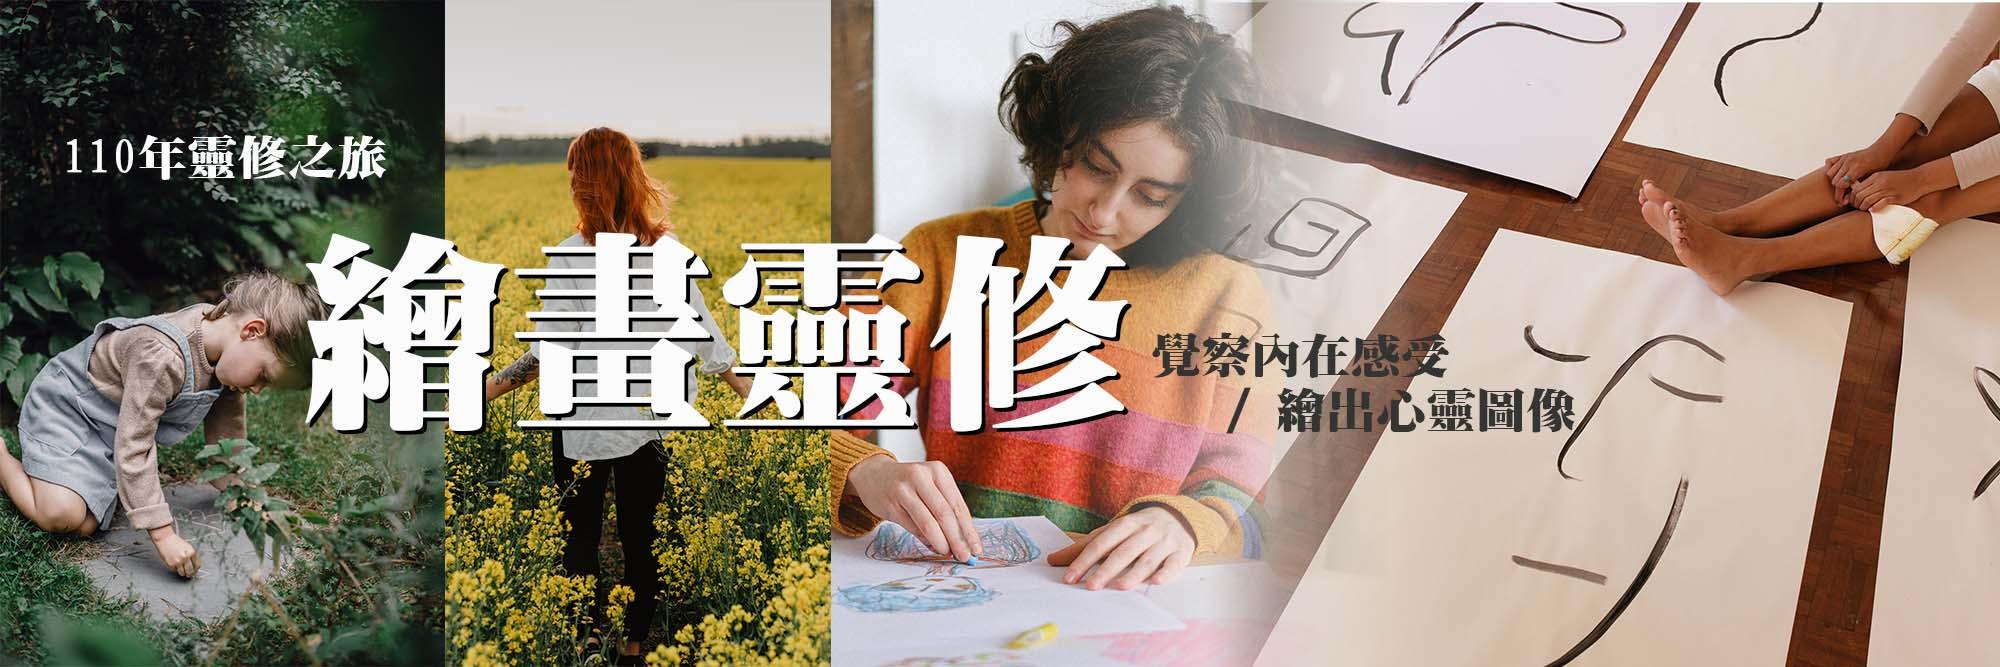 Read more about the article 台灣基督徒女性靈修協會<br/>110年靈修之旅 – 繪畫靈修